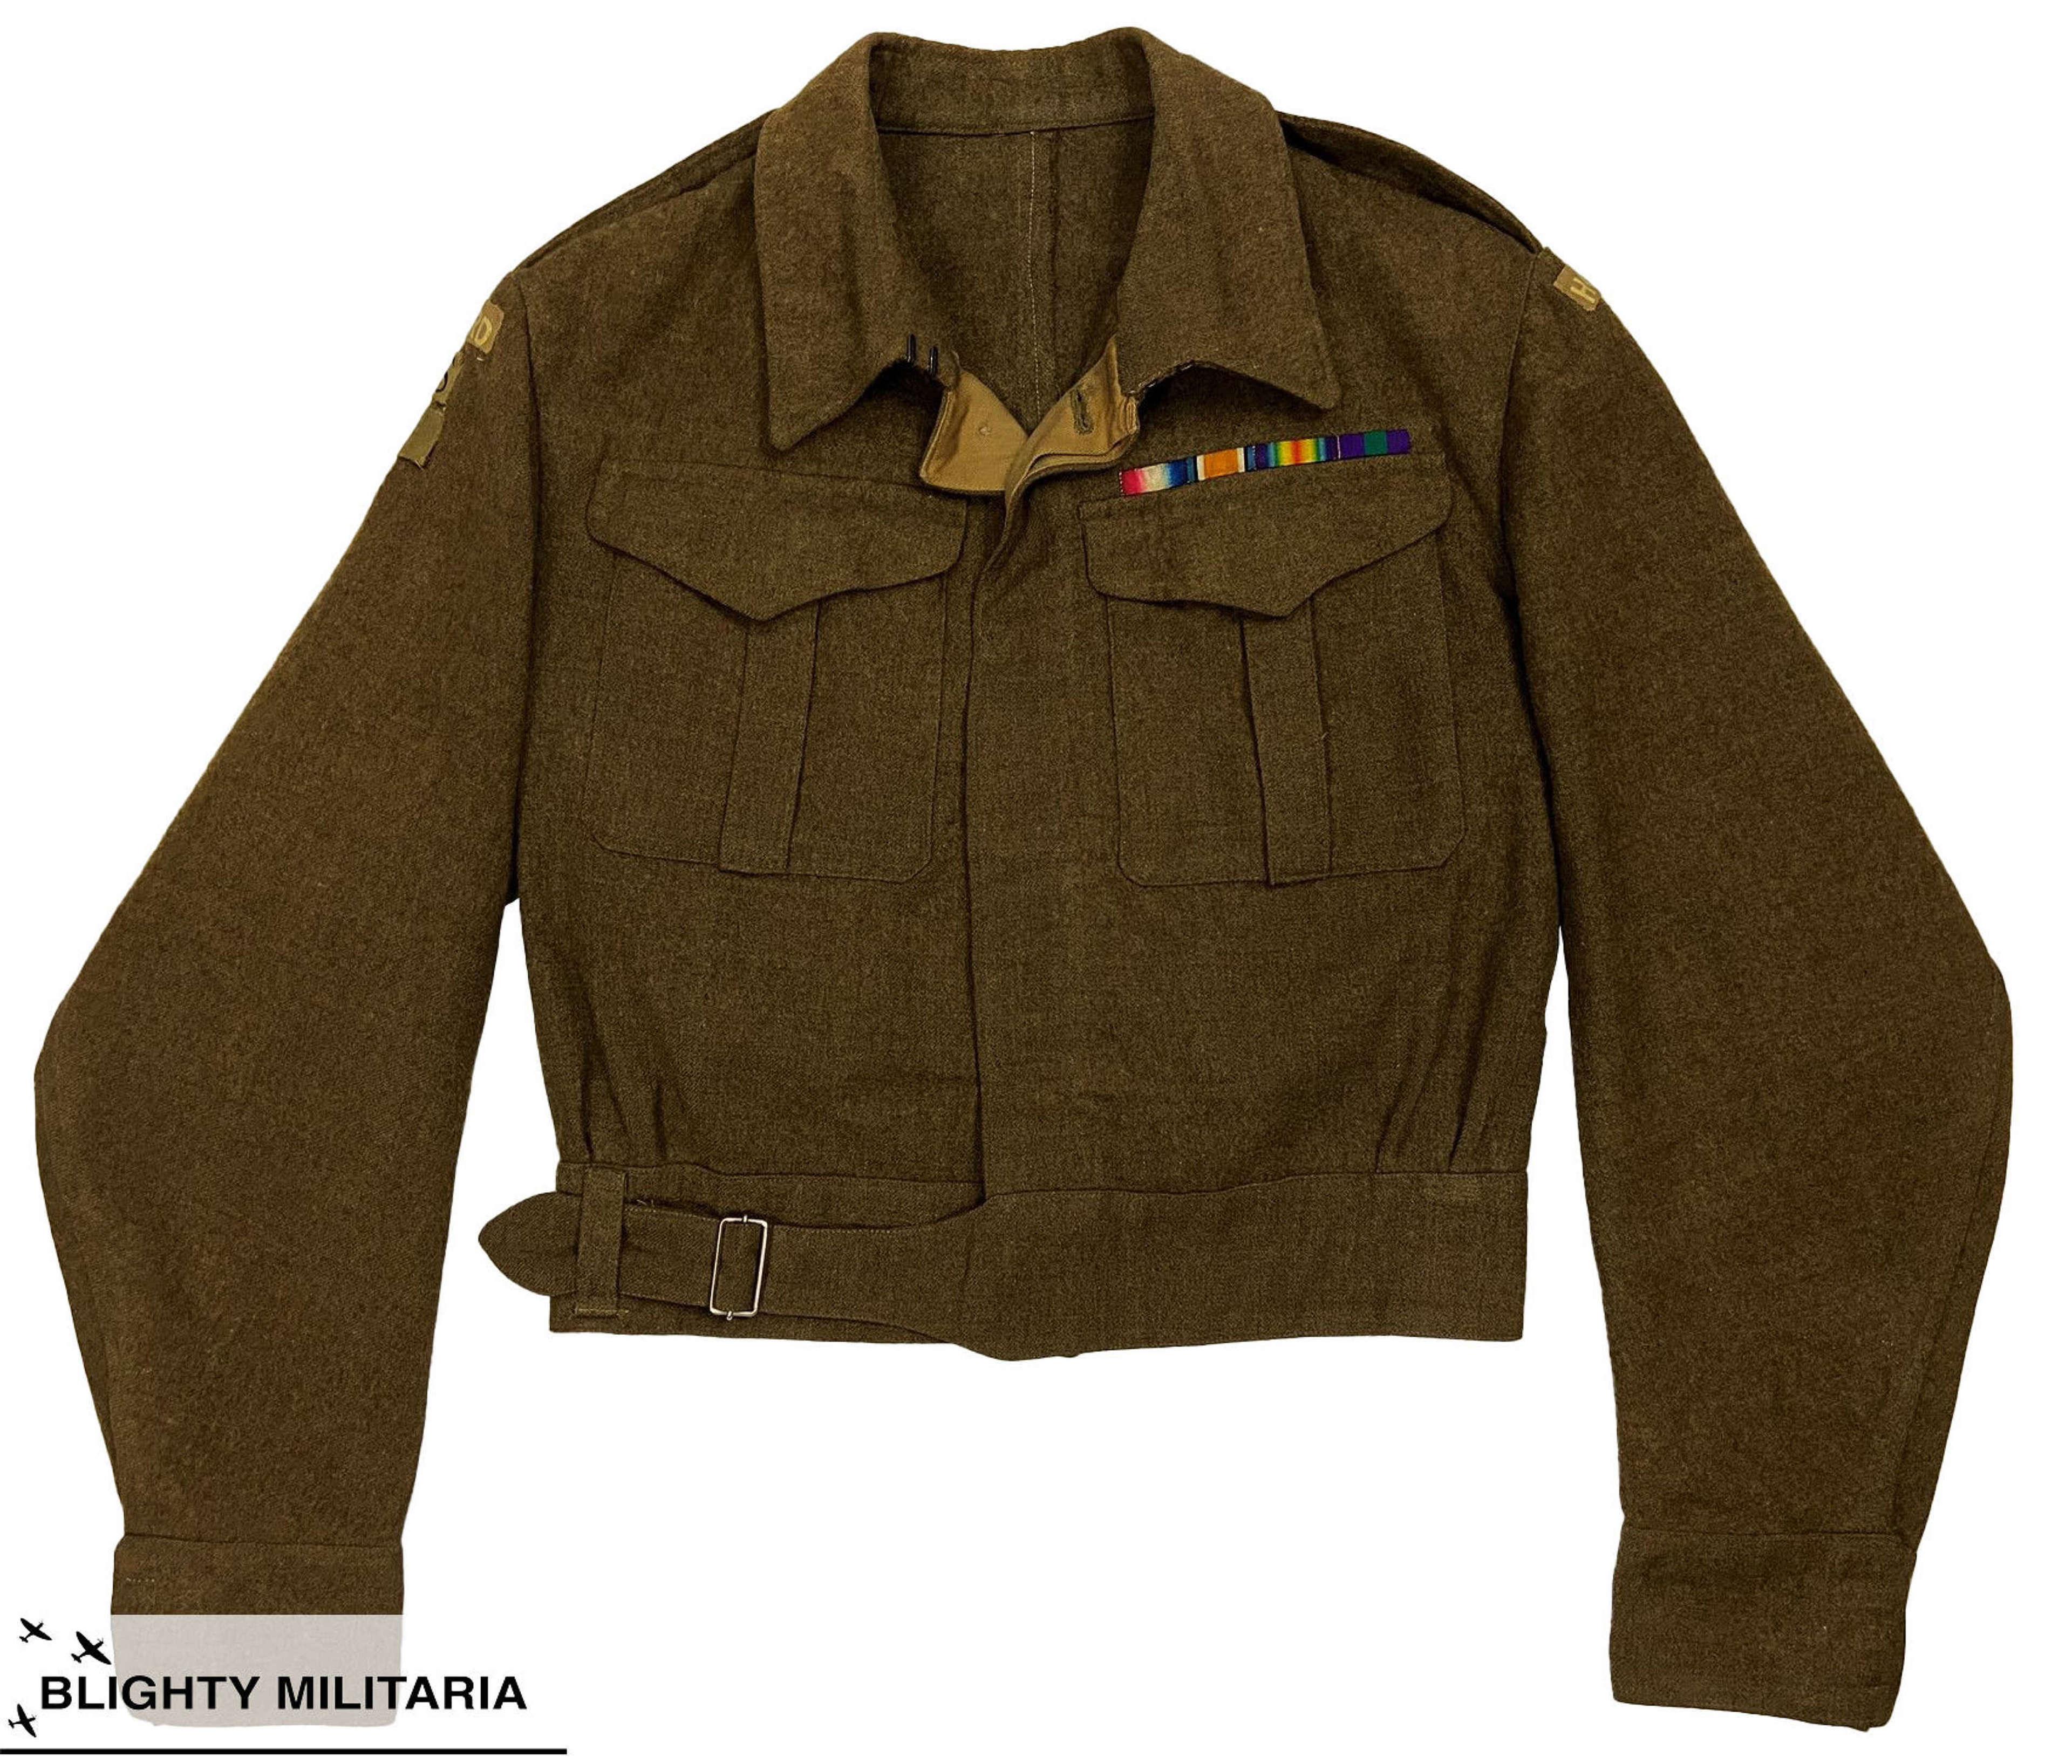 Original Early WW2 British Battledress, Serge Blouse - Home Guard